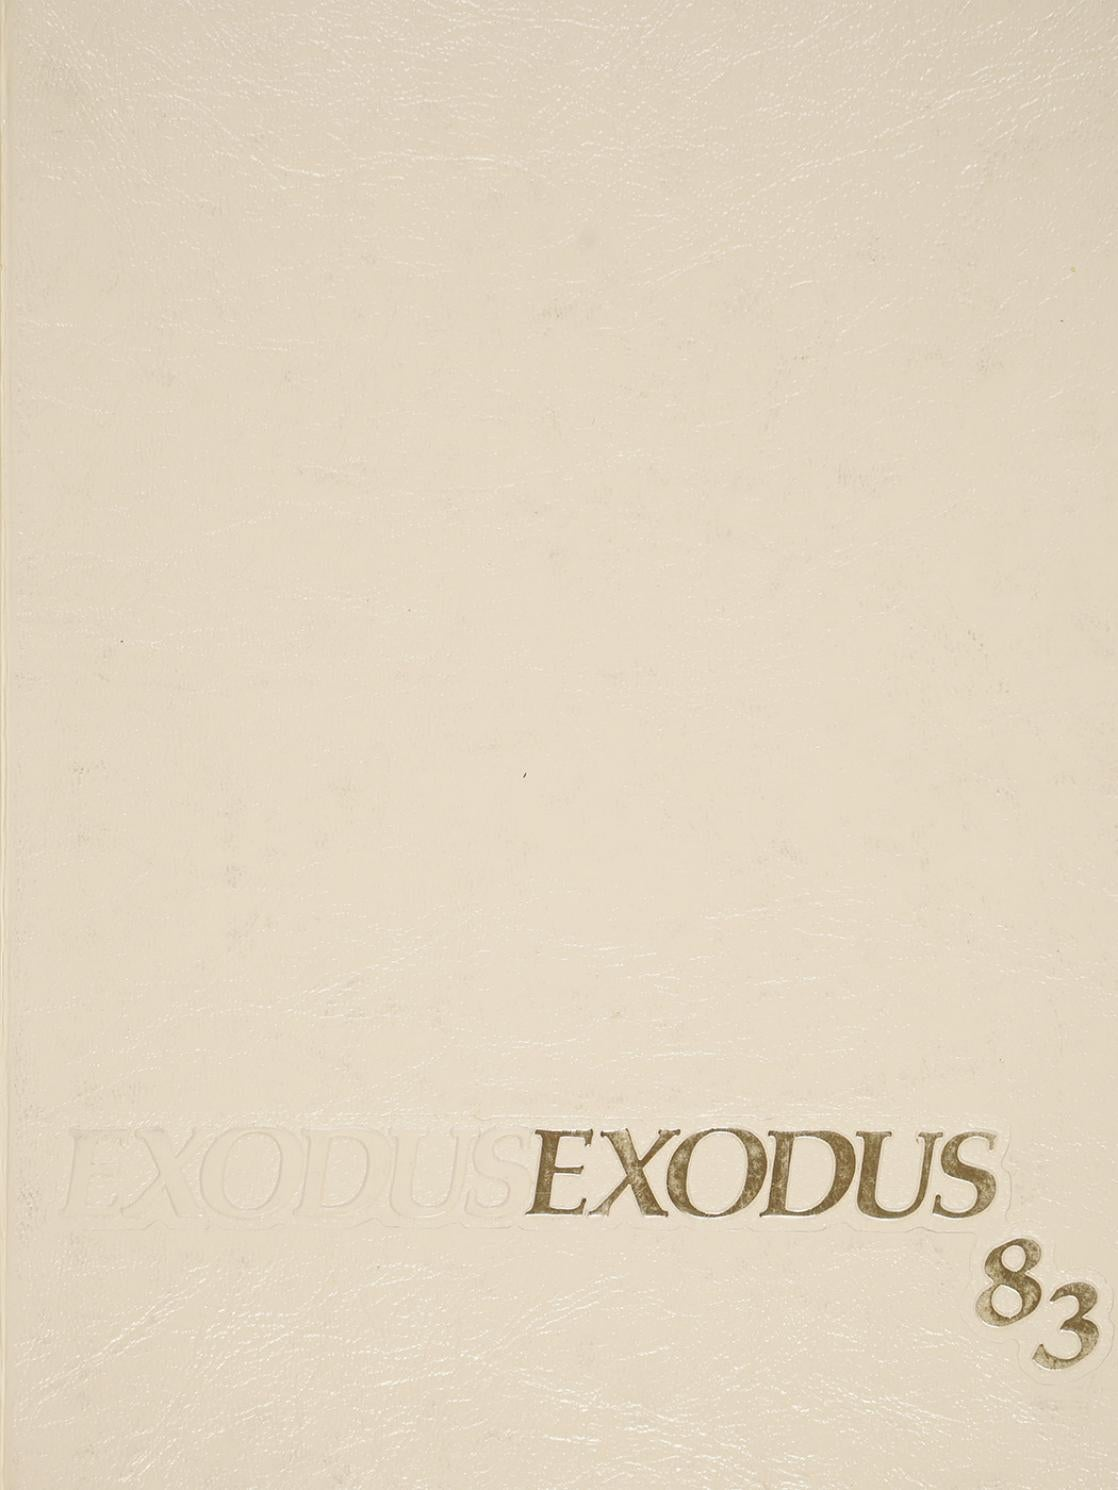 Exodus 1983 Yearbook By Rhode Island College Digitial Initiatives